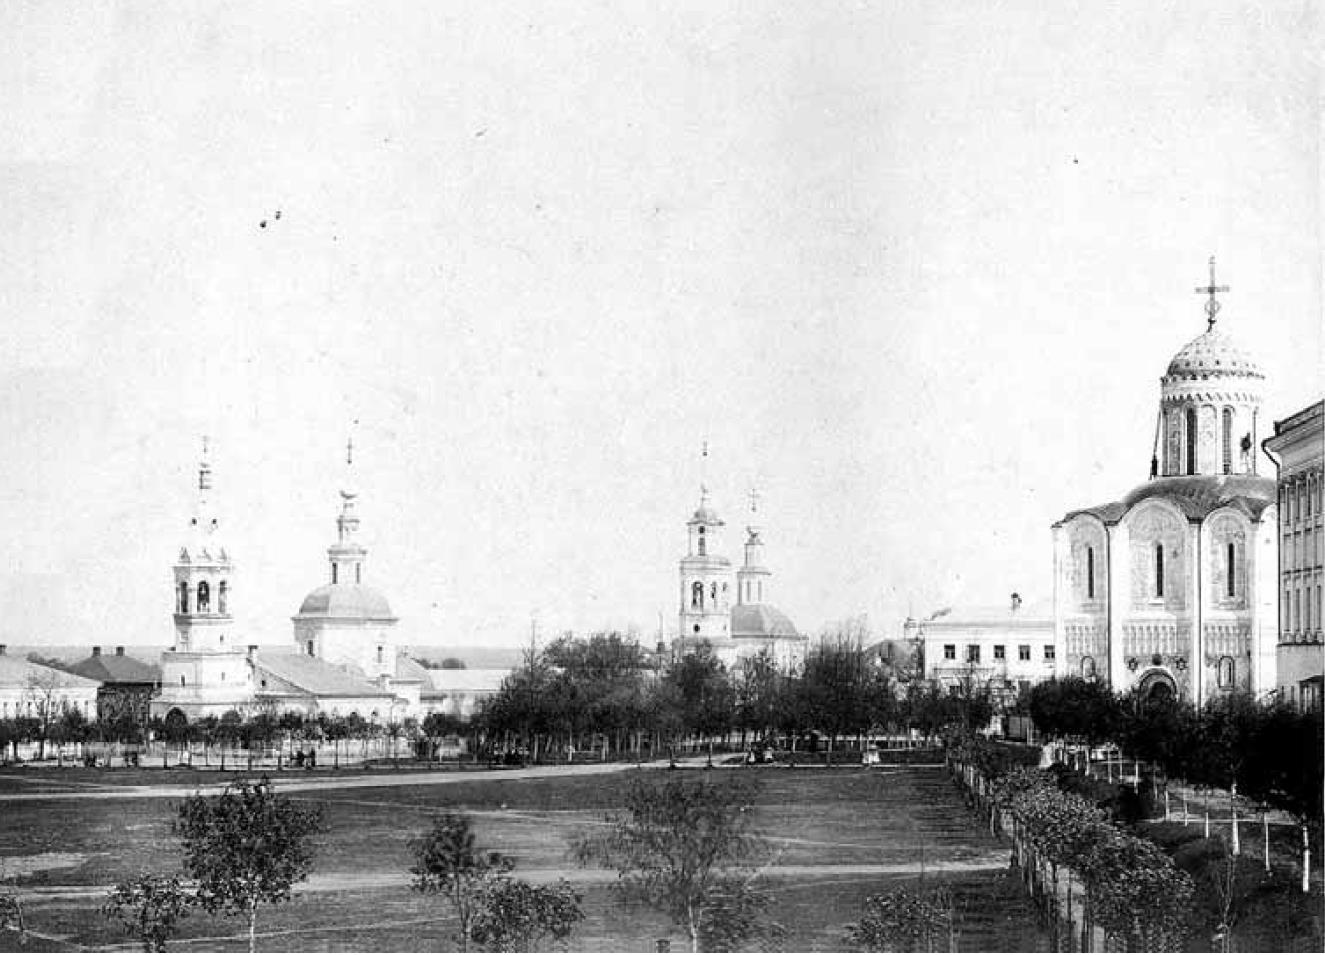 Плац-парадная площадь. Мелехов Я.Я. Конец XIX в.